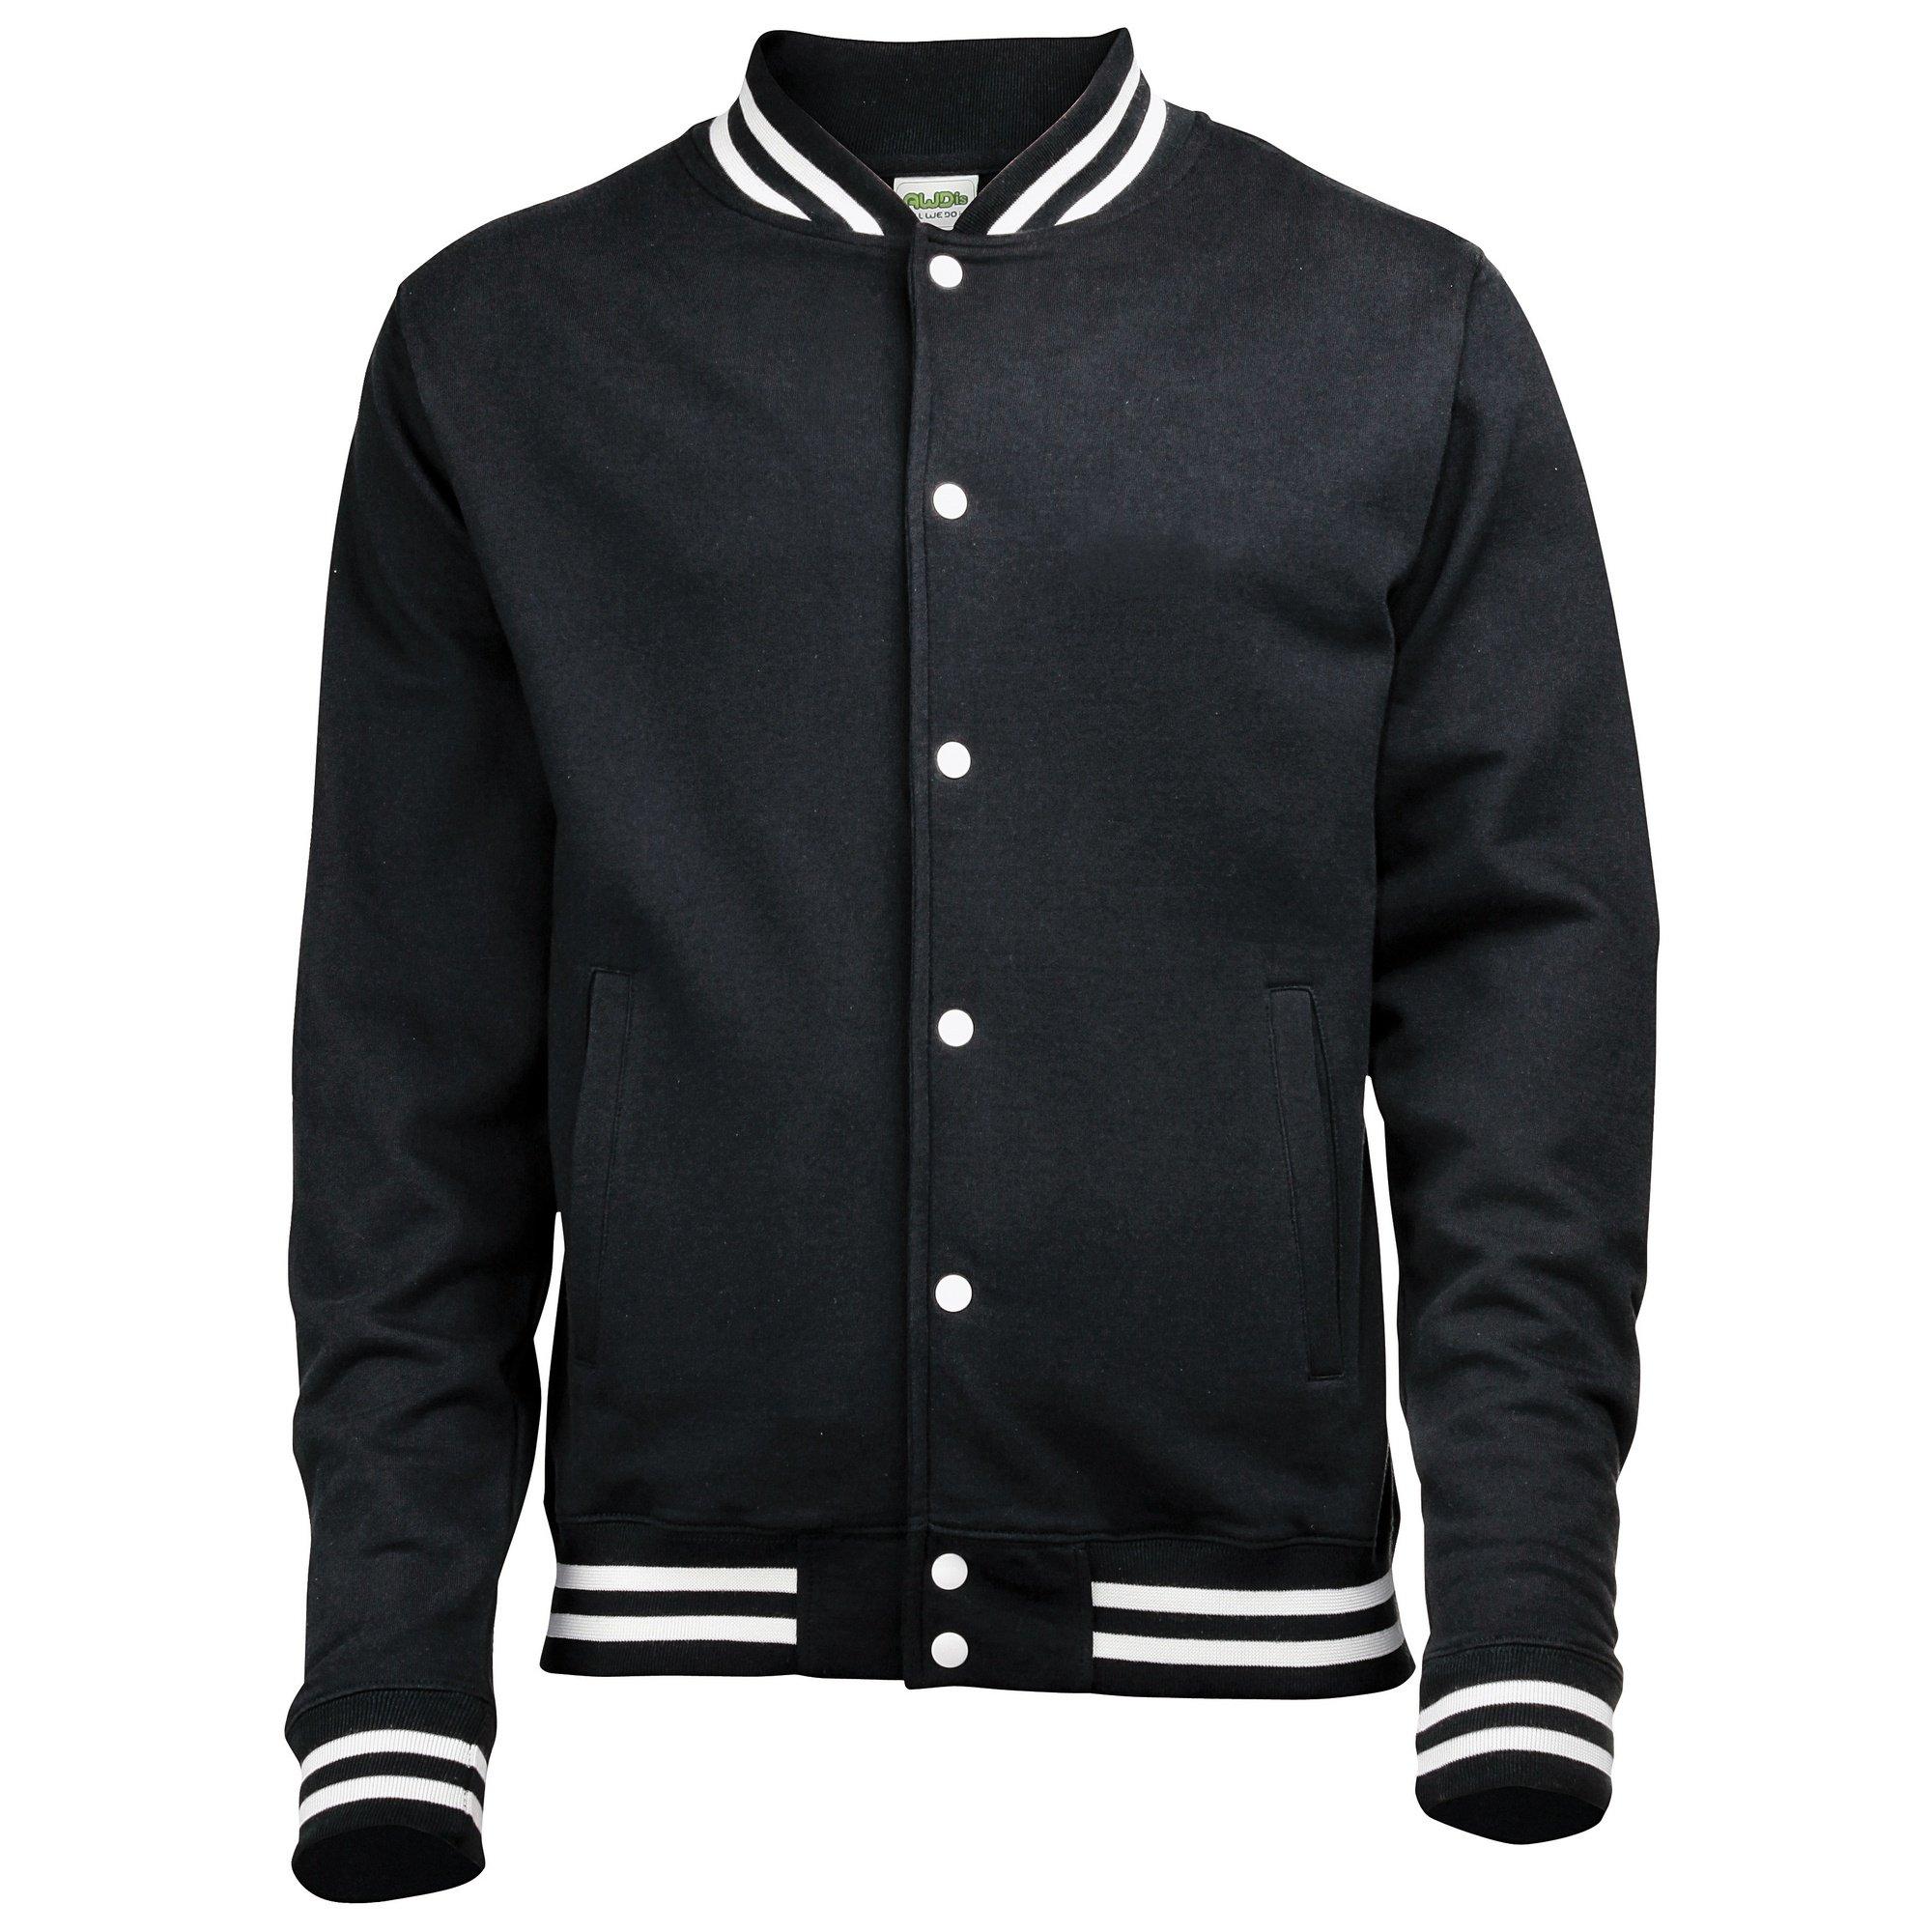 Awdis Mens College Jacket (M) (Jet Black) by Awdis